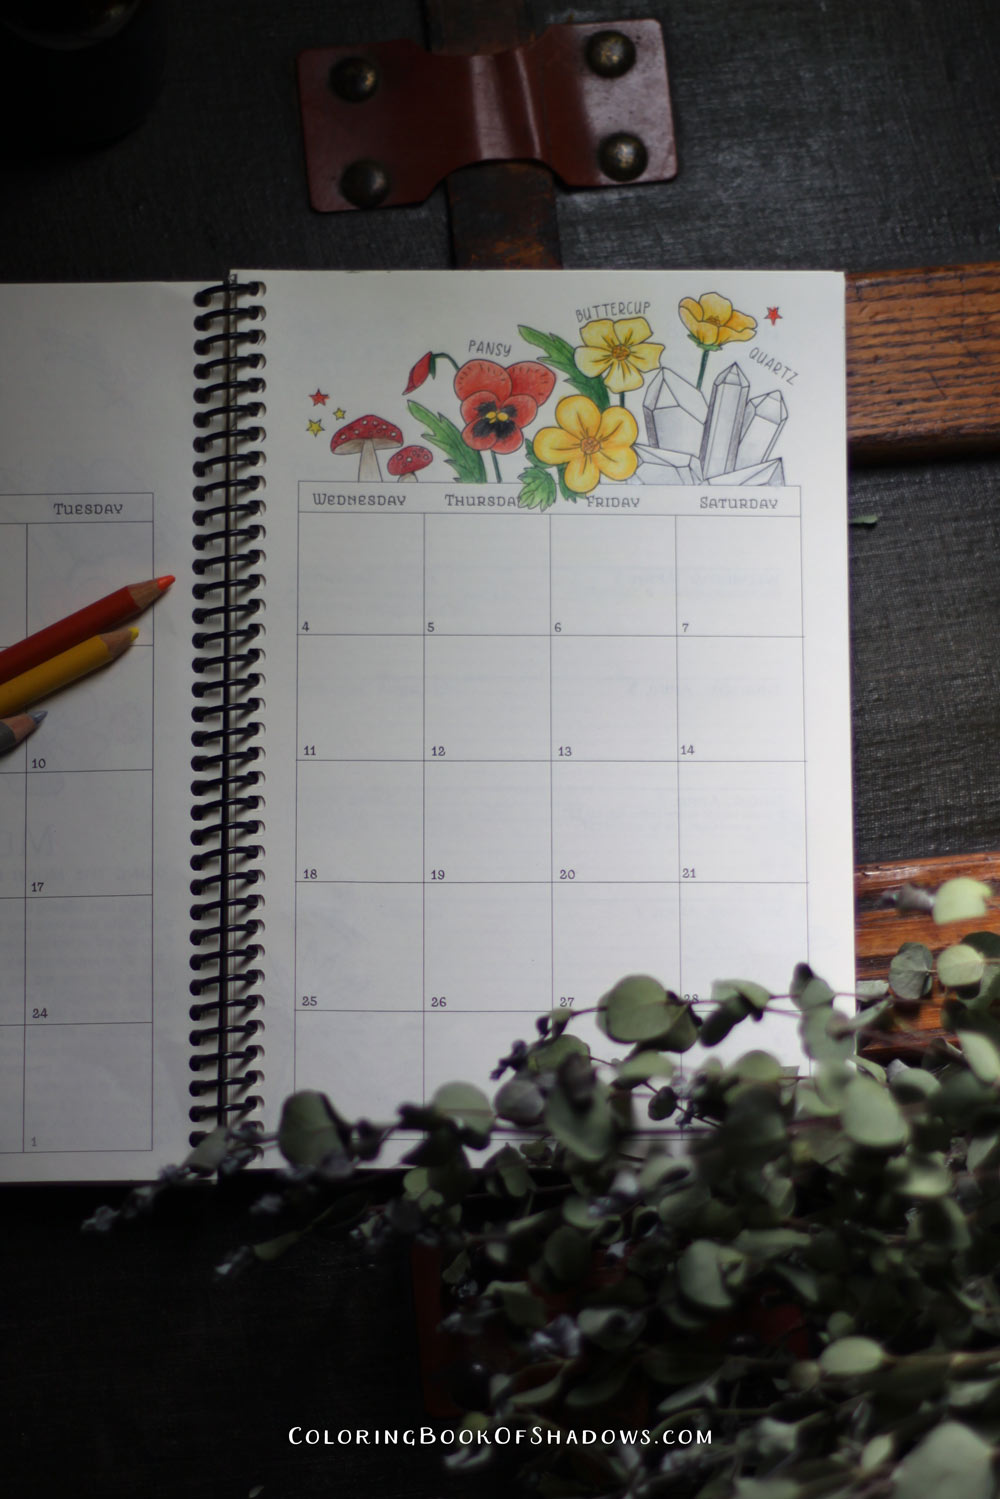 Quartz, floral correspondences and more magical coloring inspiration.